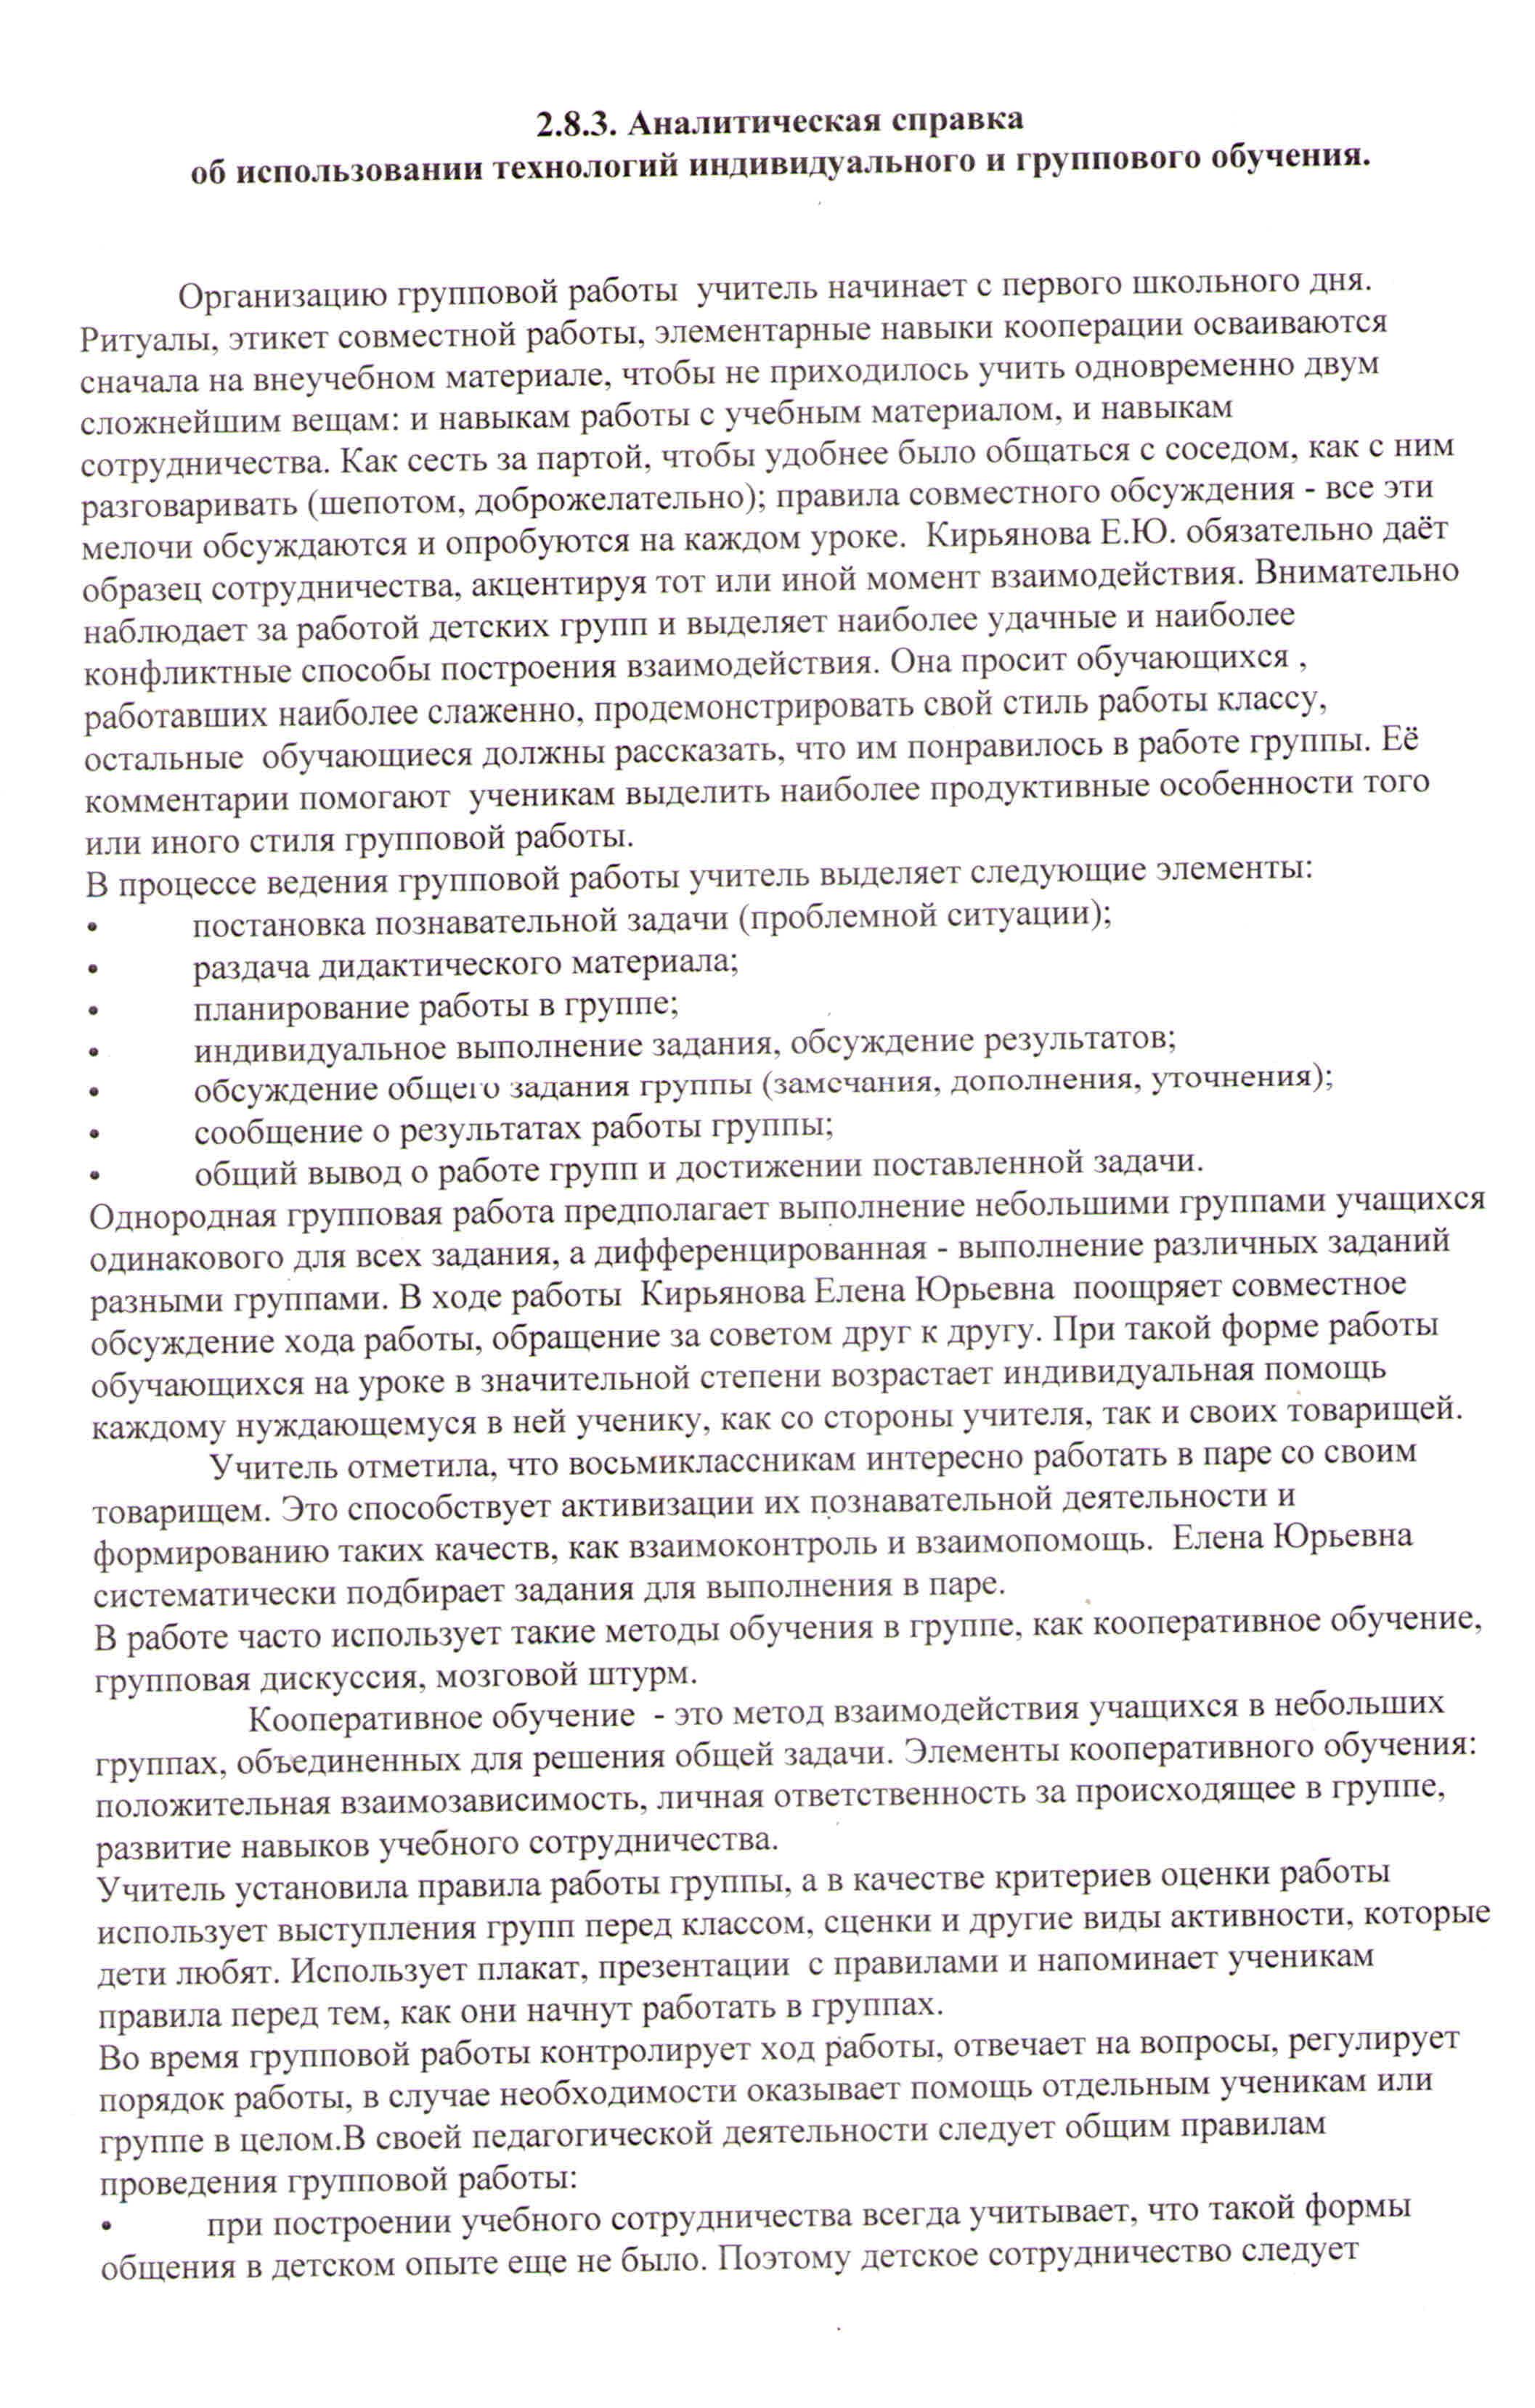 C:\Users\Сергей\Desktop\аналитсправка\Document_15.jpg